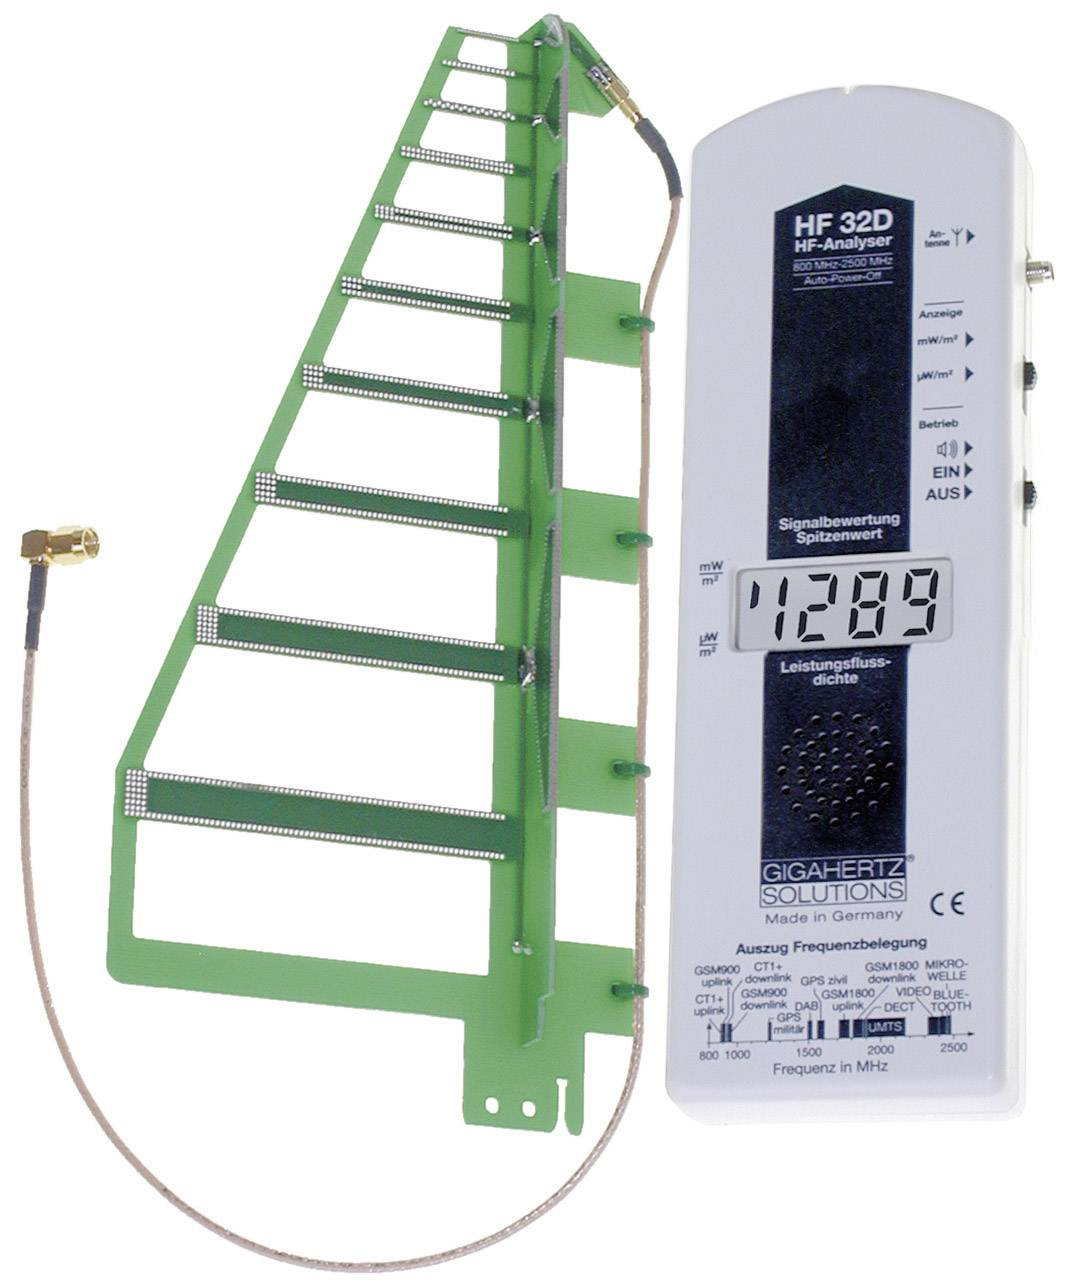 Analyzátor elektrosmogu Gigahertz HF 32D